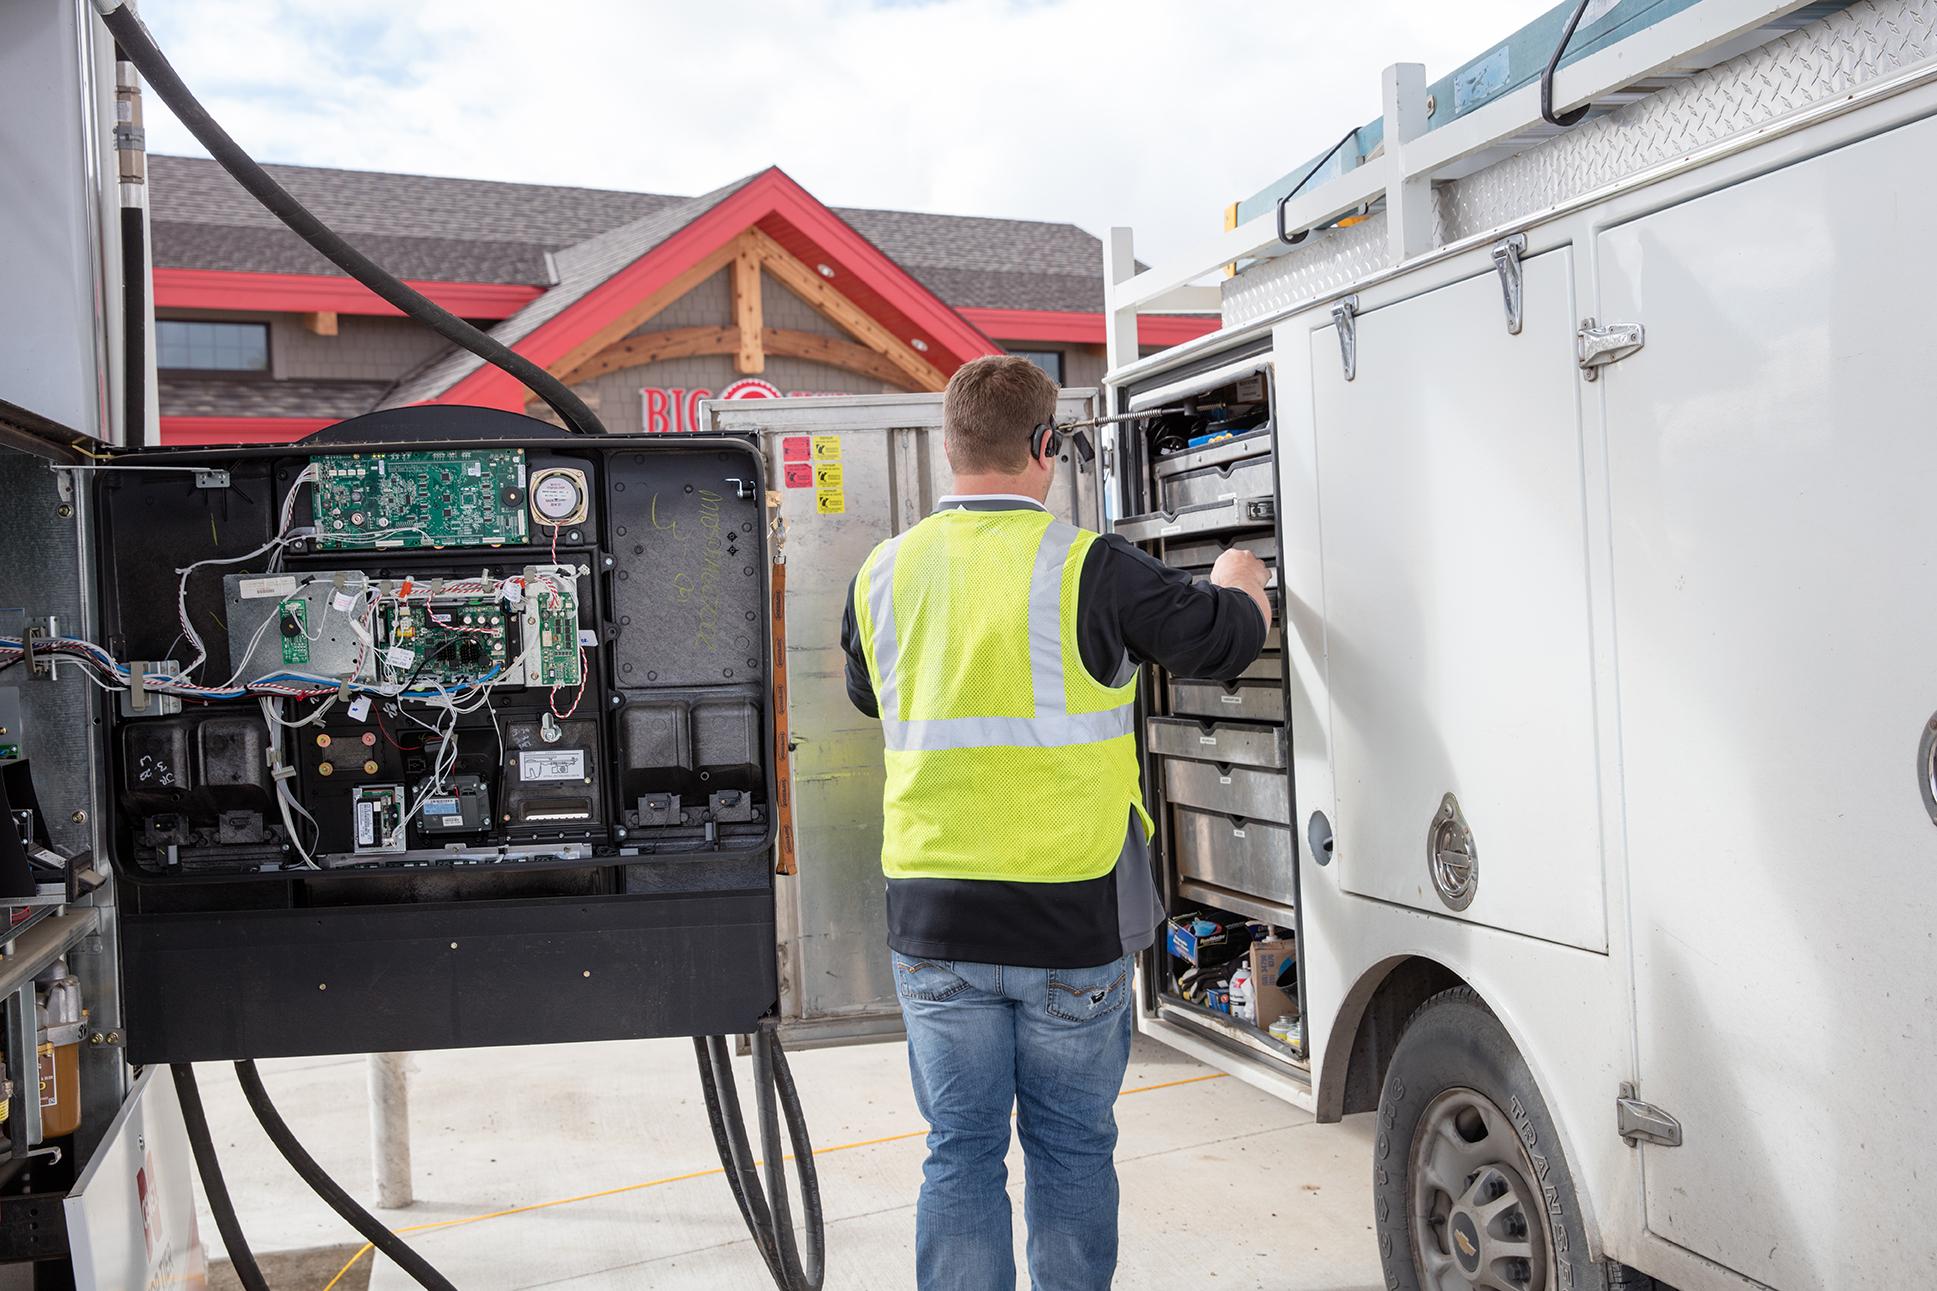 Westmor service technician fixing fuel dispenser at c-store.